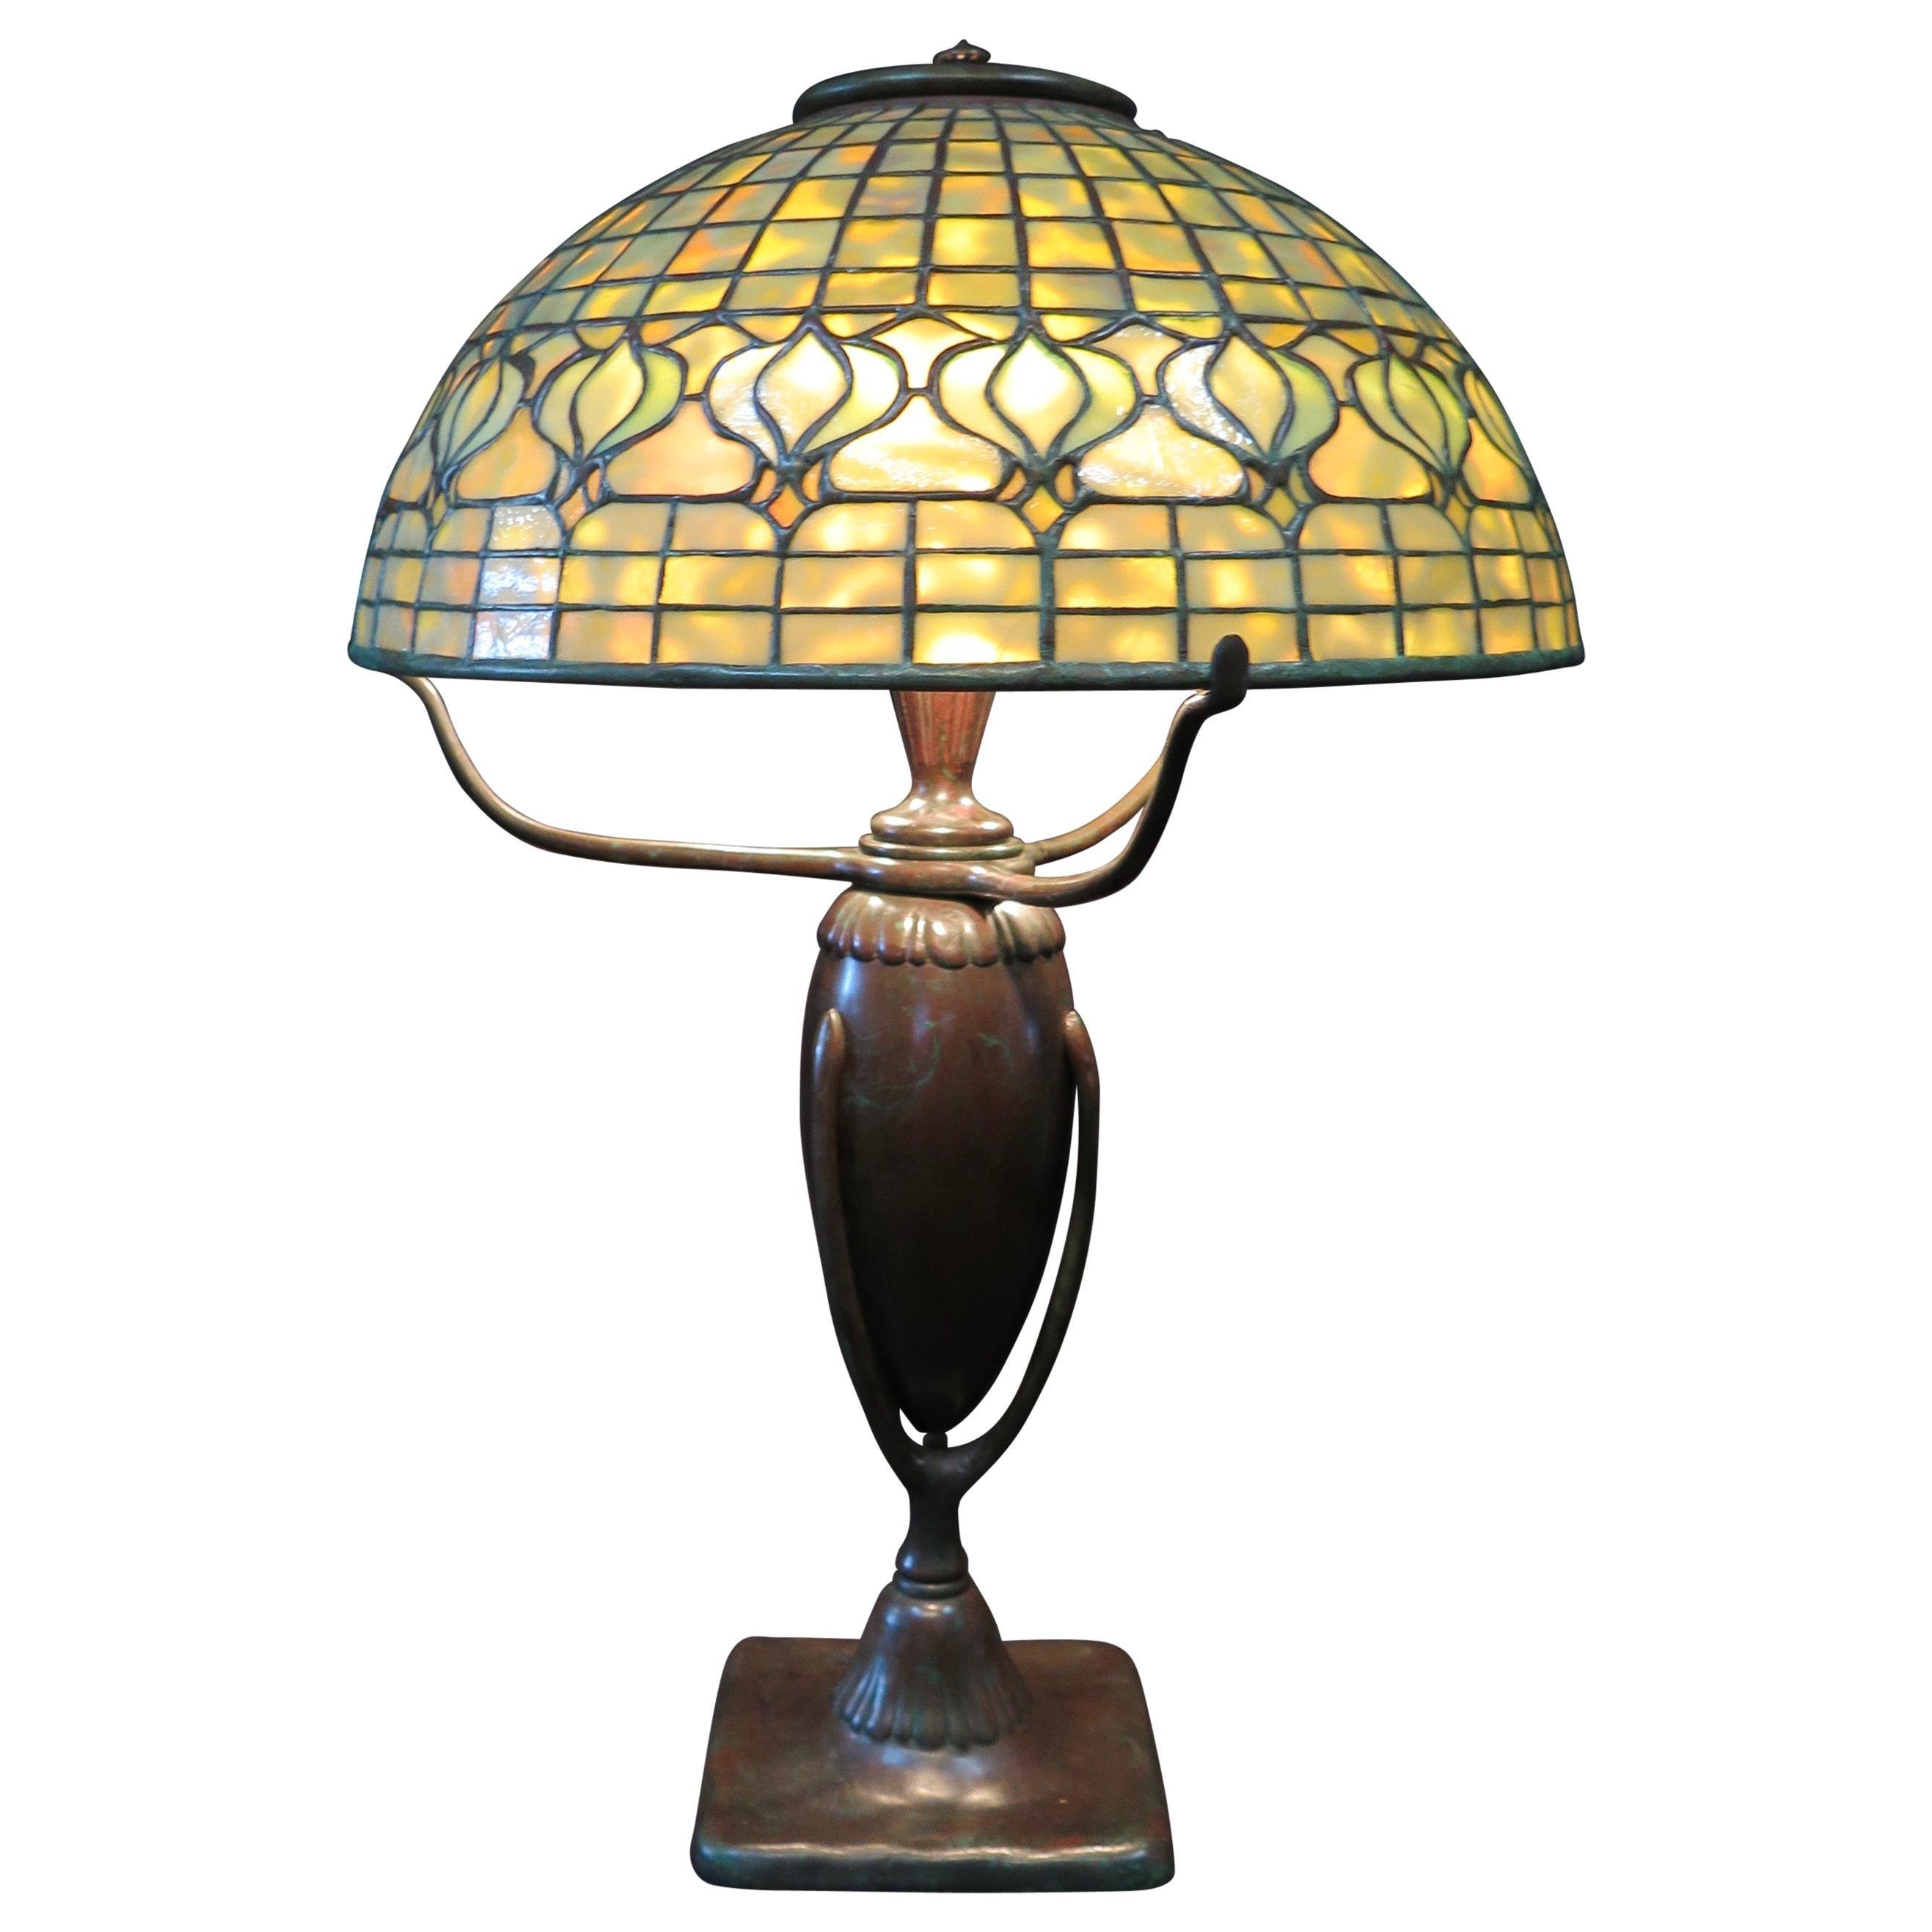 Original Tiffany Studios Pomegranate Table Lamp